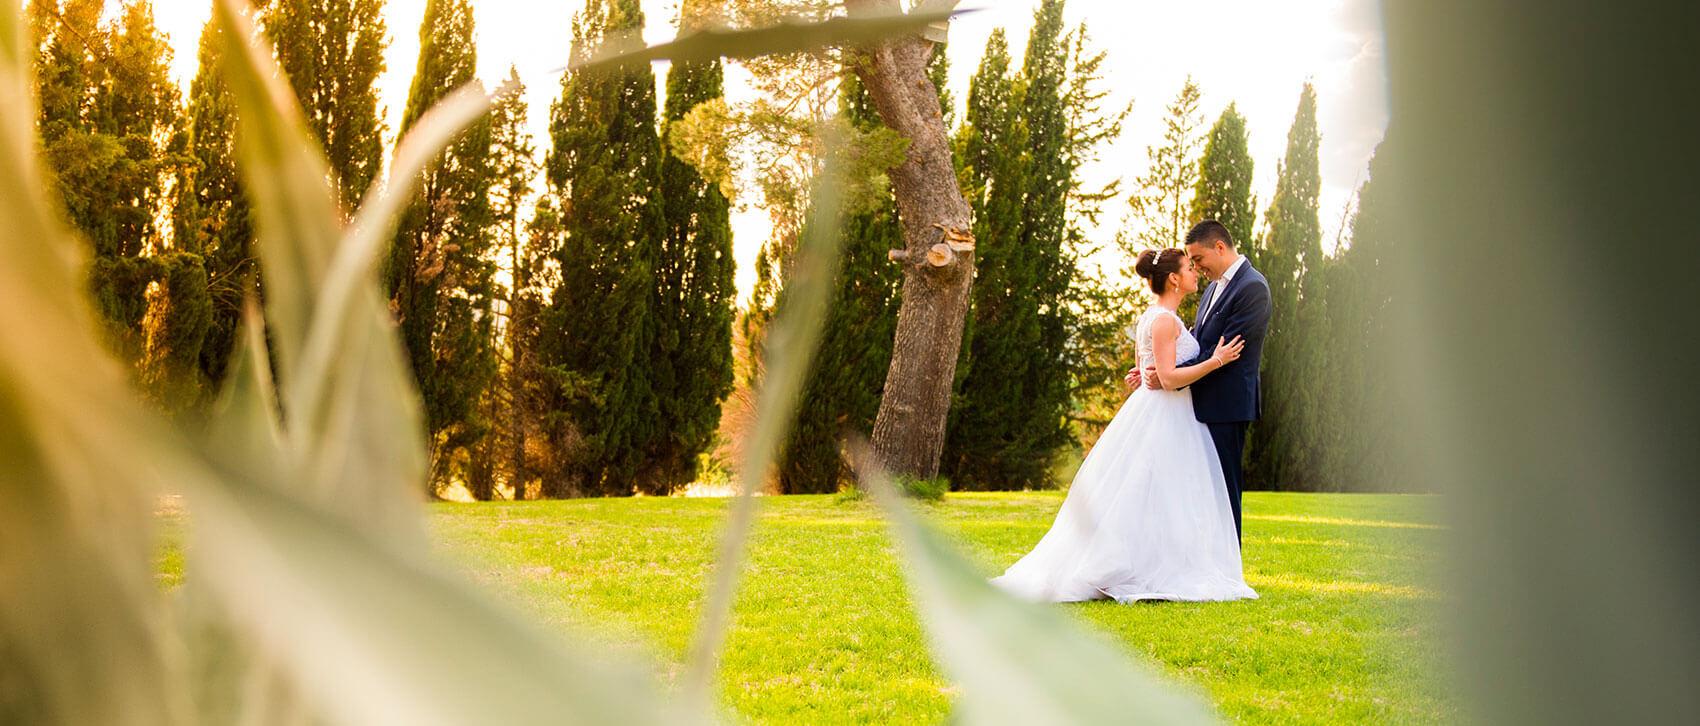 Slideshow - Reportage mariage béziers